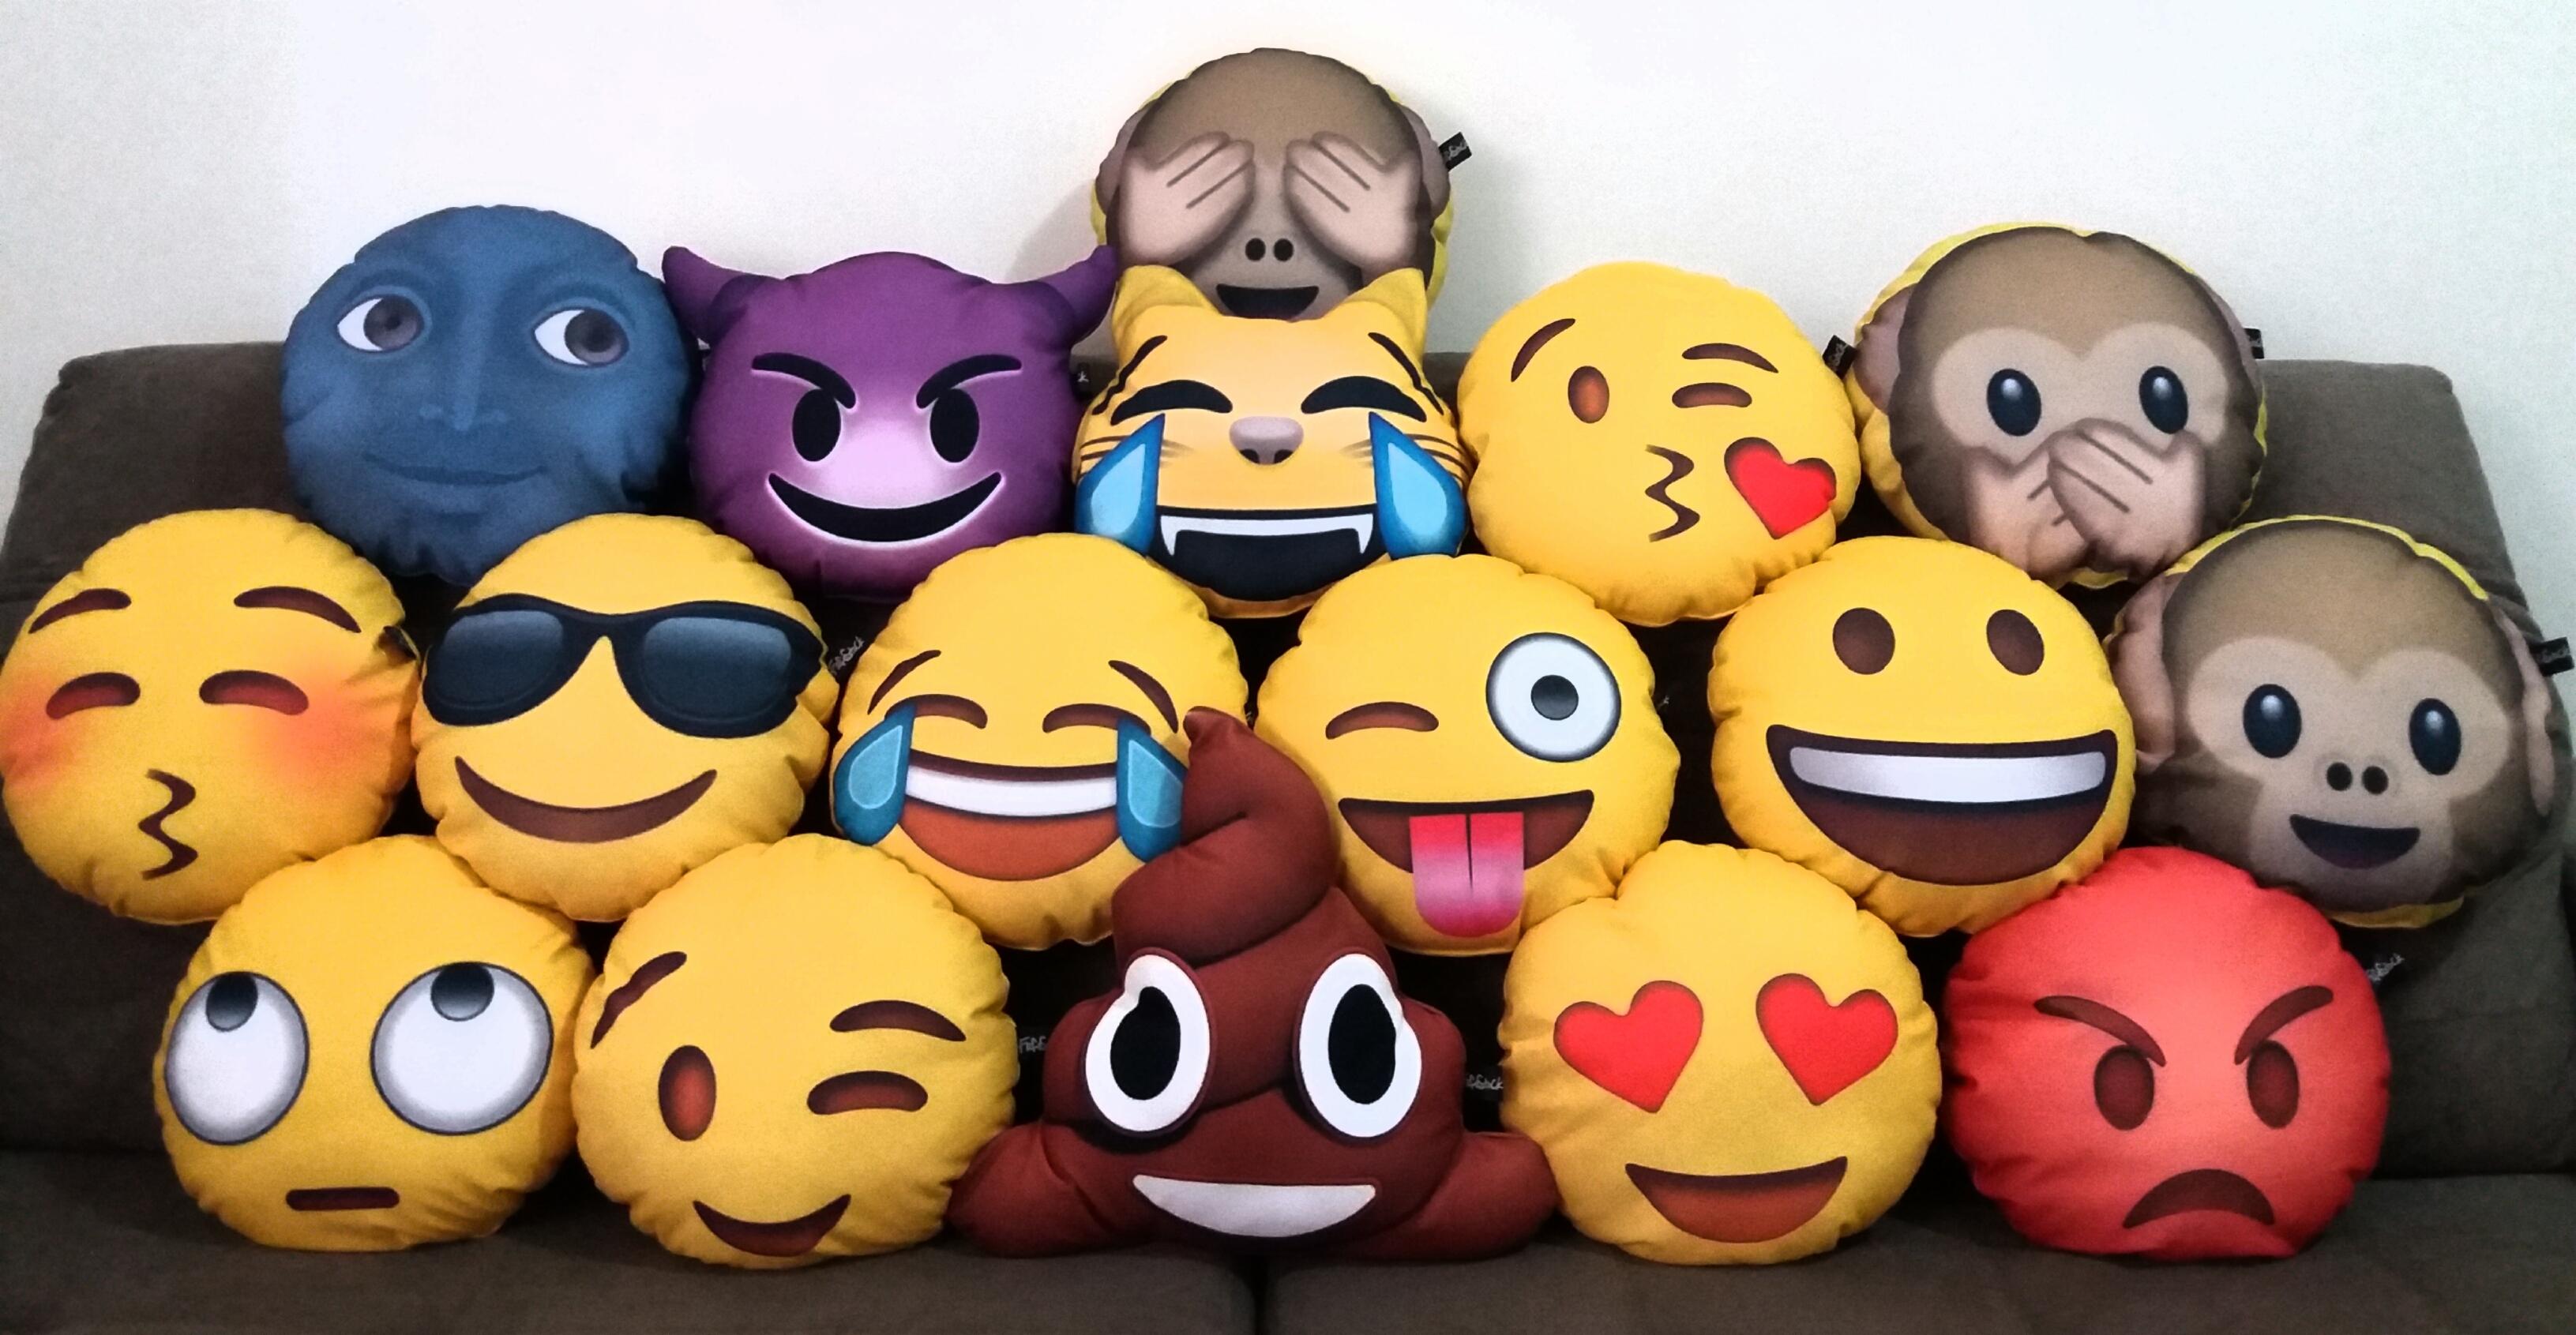 Almofada Smile Whatsapp com Oculos   Elo7 543ce23fbf